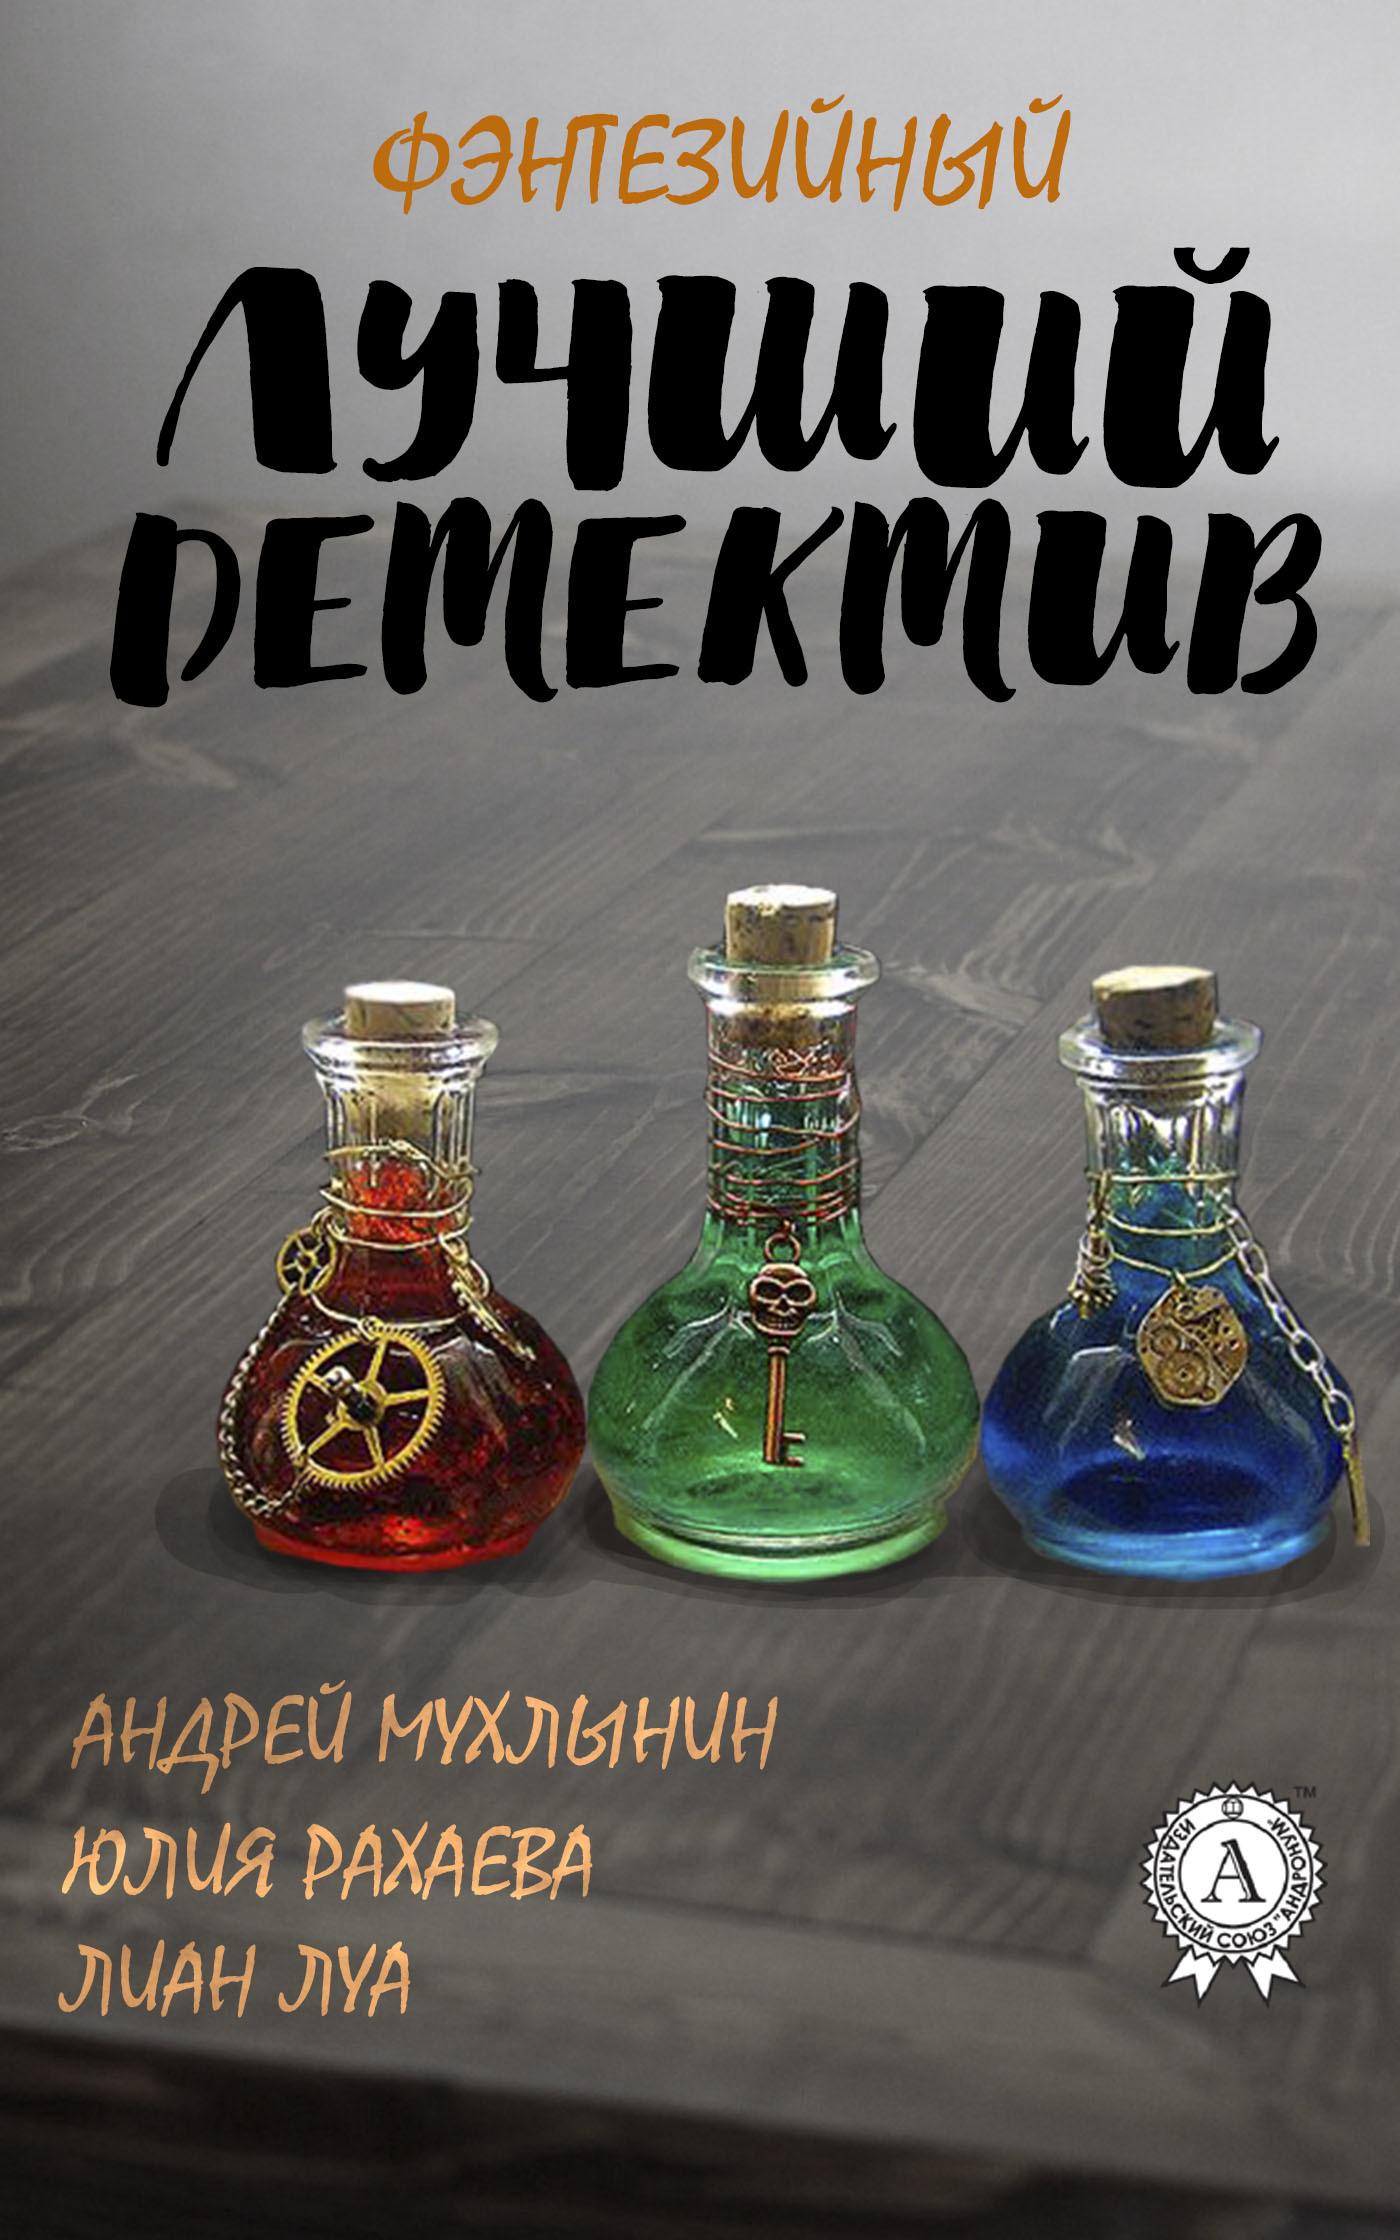 Андрей Мухлынин бесплатно